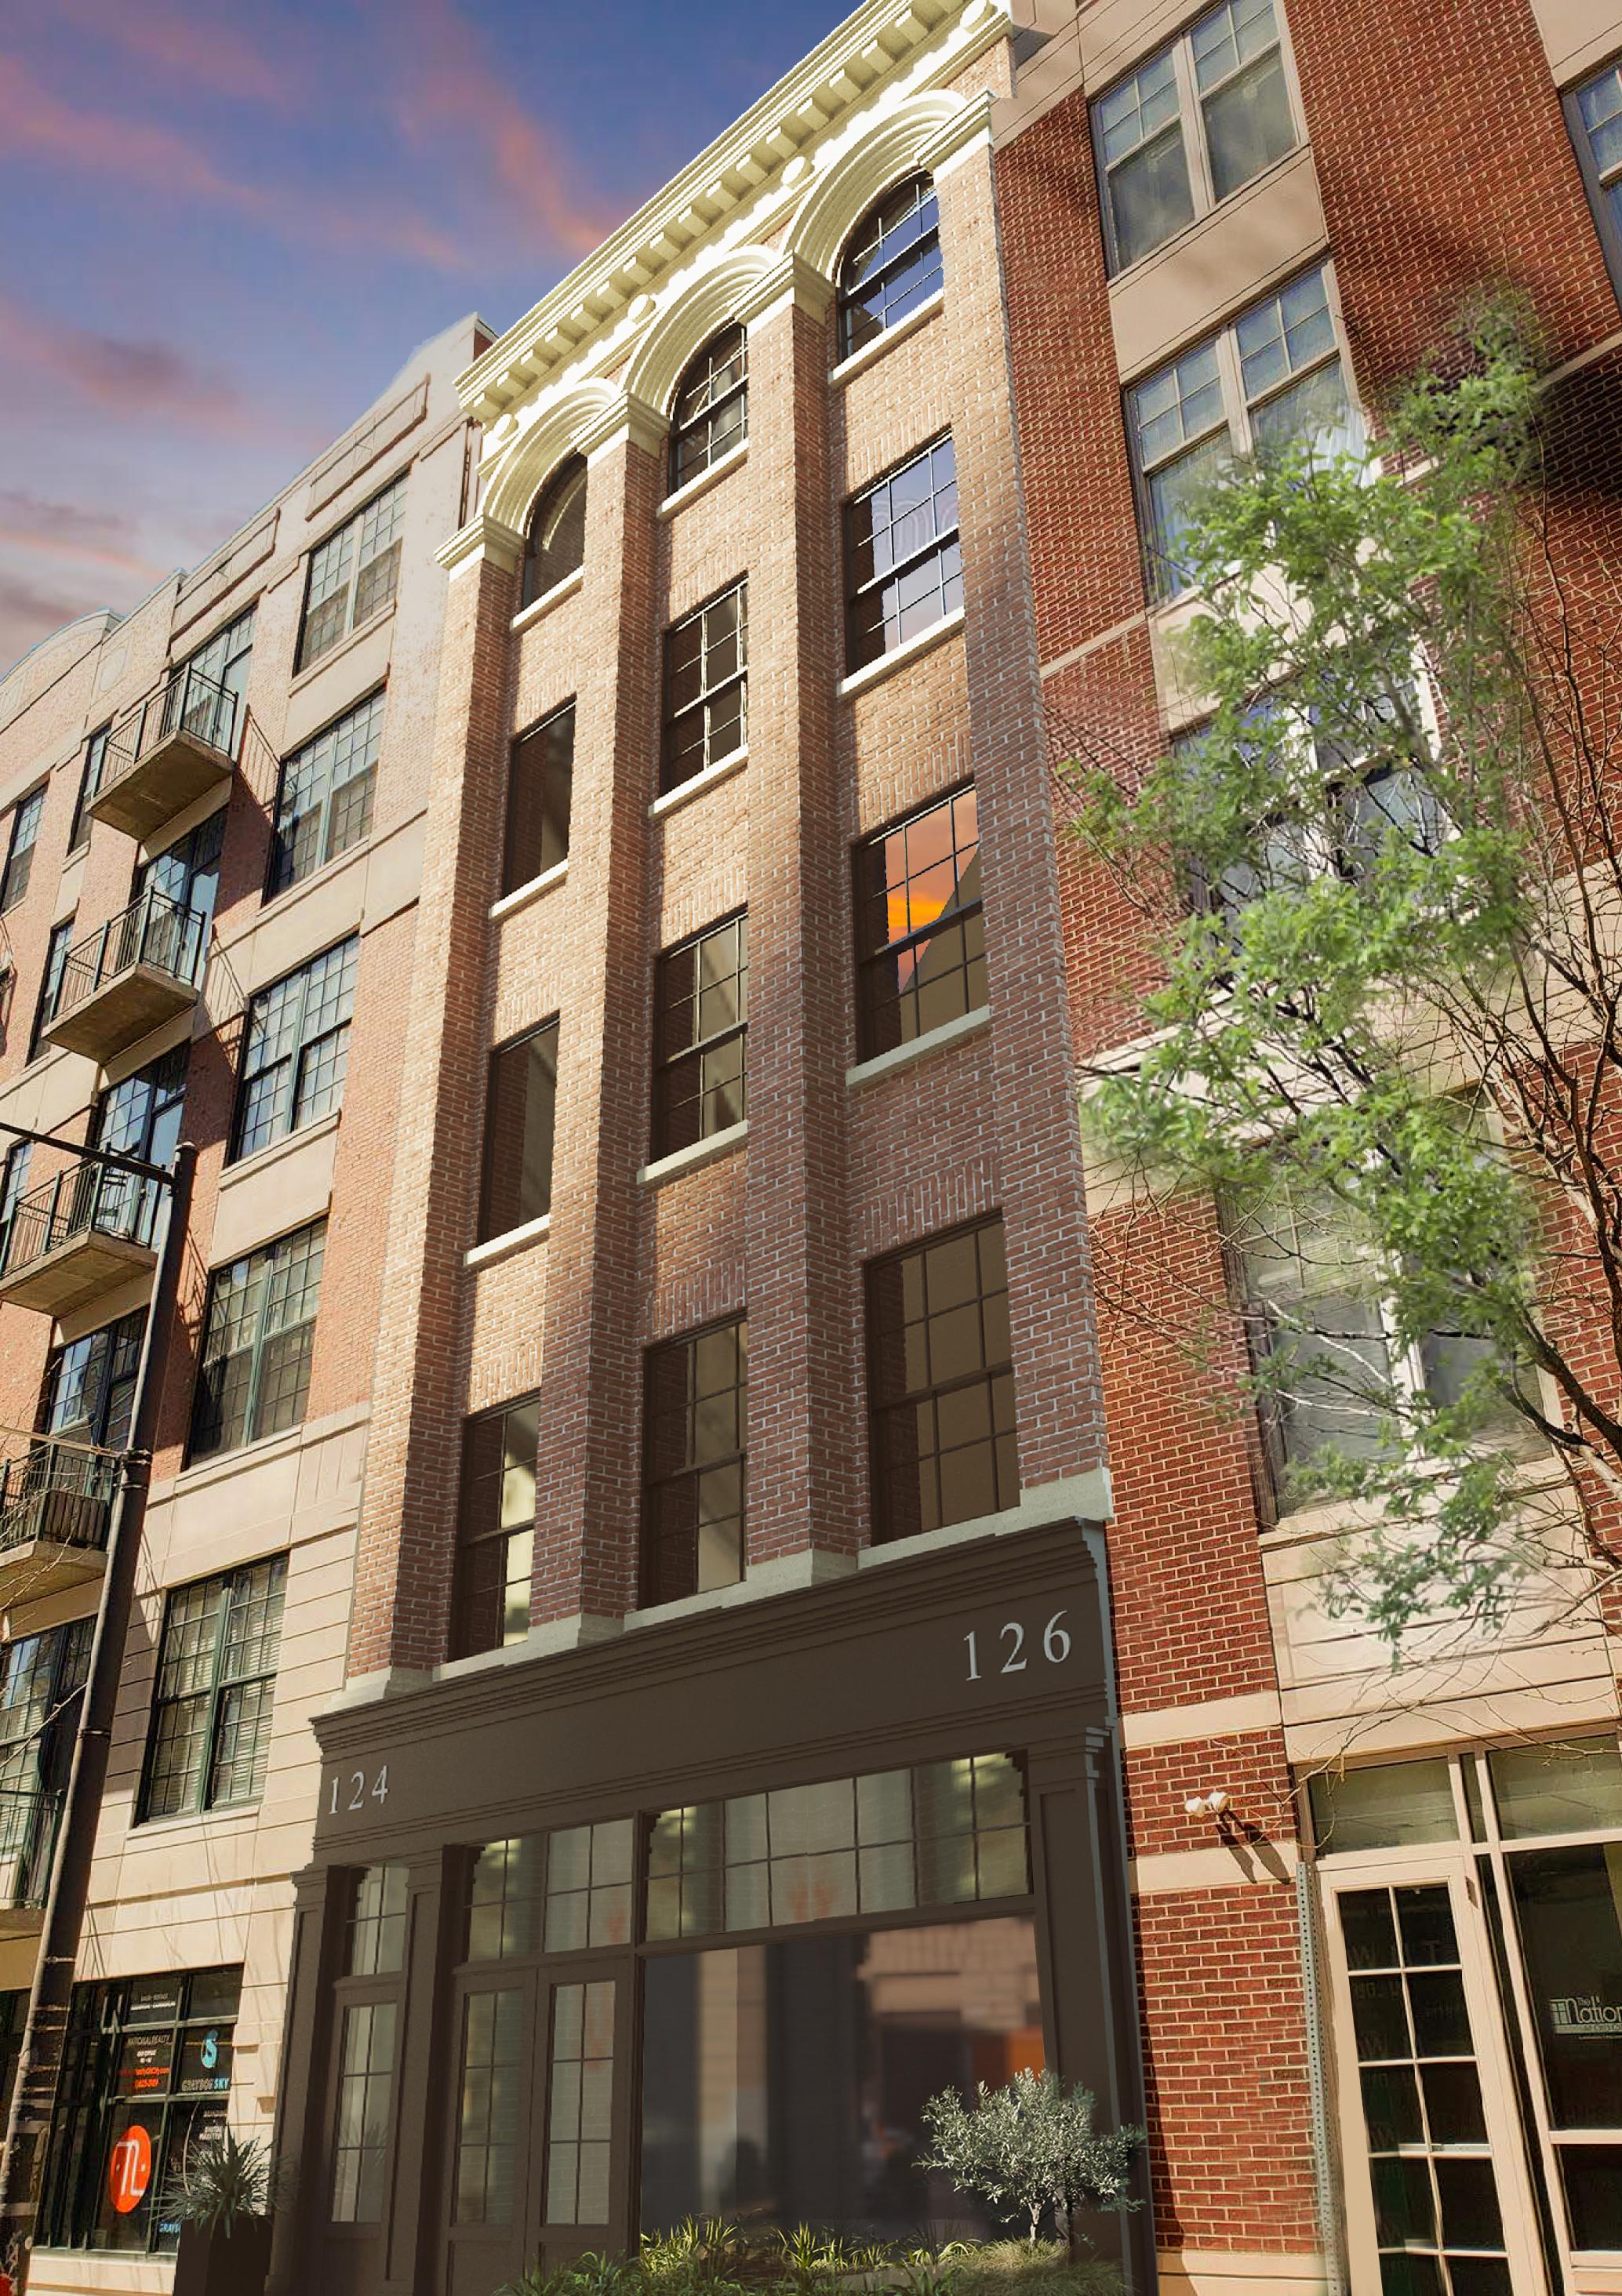 Current Development - 124 North 2nd Street - Astoban Realty Group (ARG) - Philadelphia, PA - Luxury Condominiums